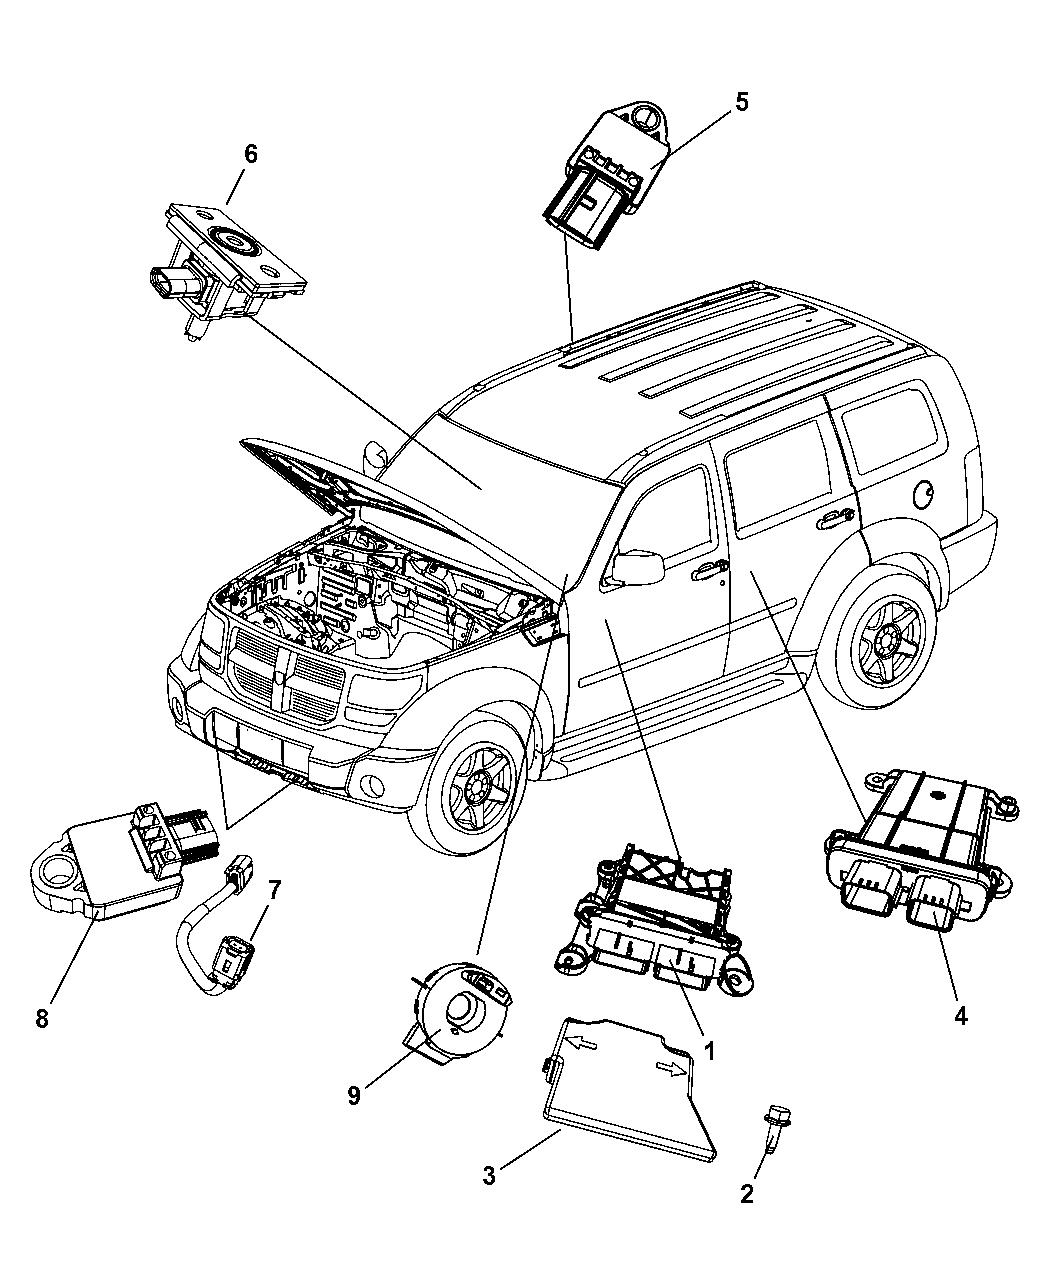 68003216ag